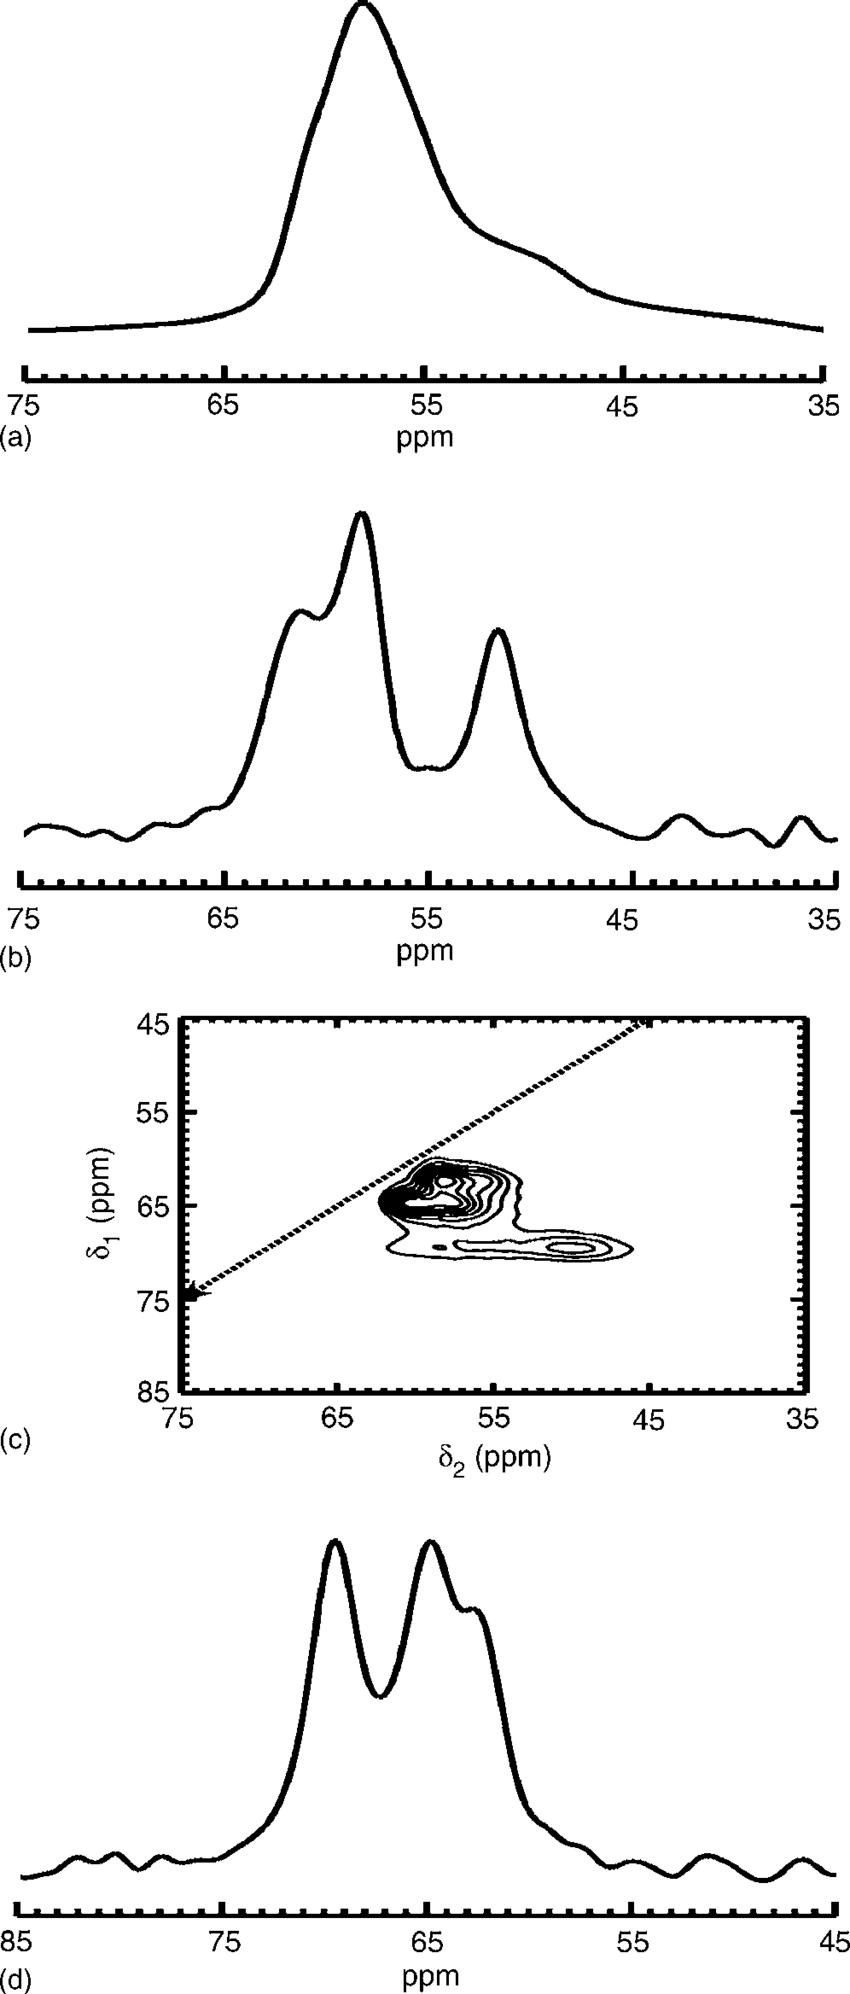 medium resolution of a 27 al mas spectrum of a powdered mesolite sample b 27 al mas download scientific diagram